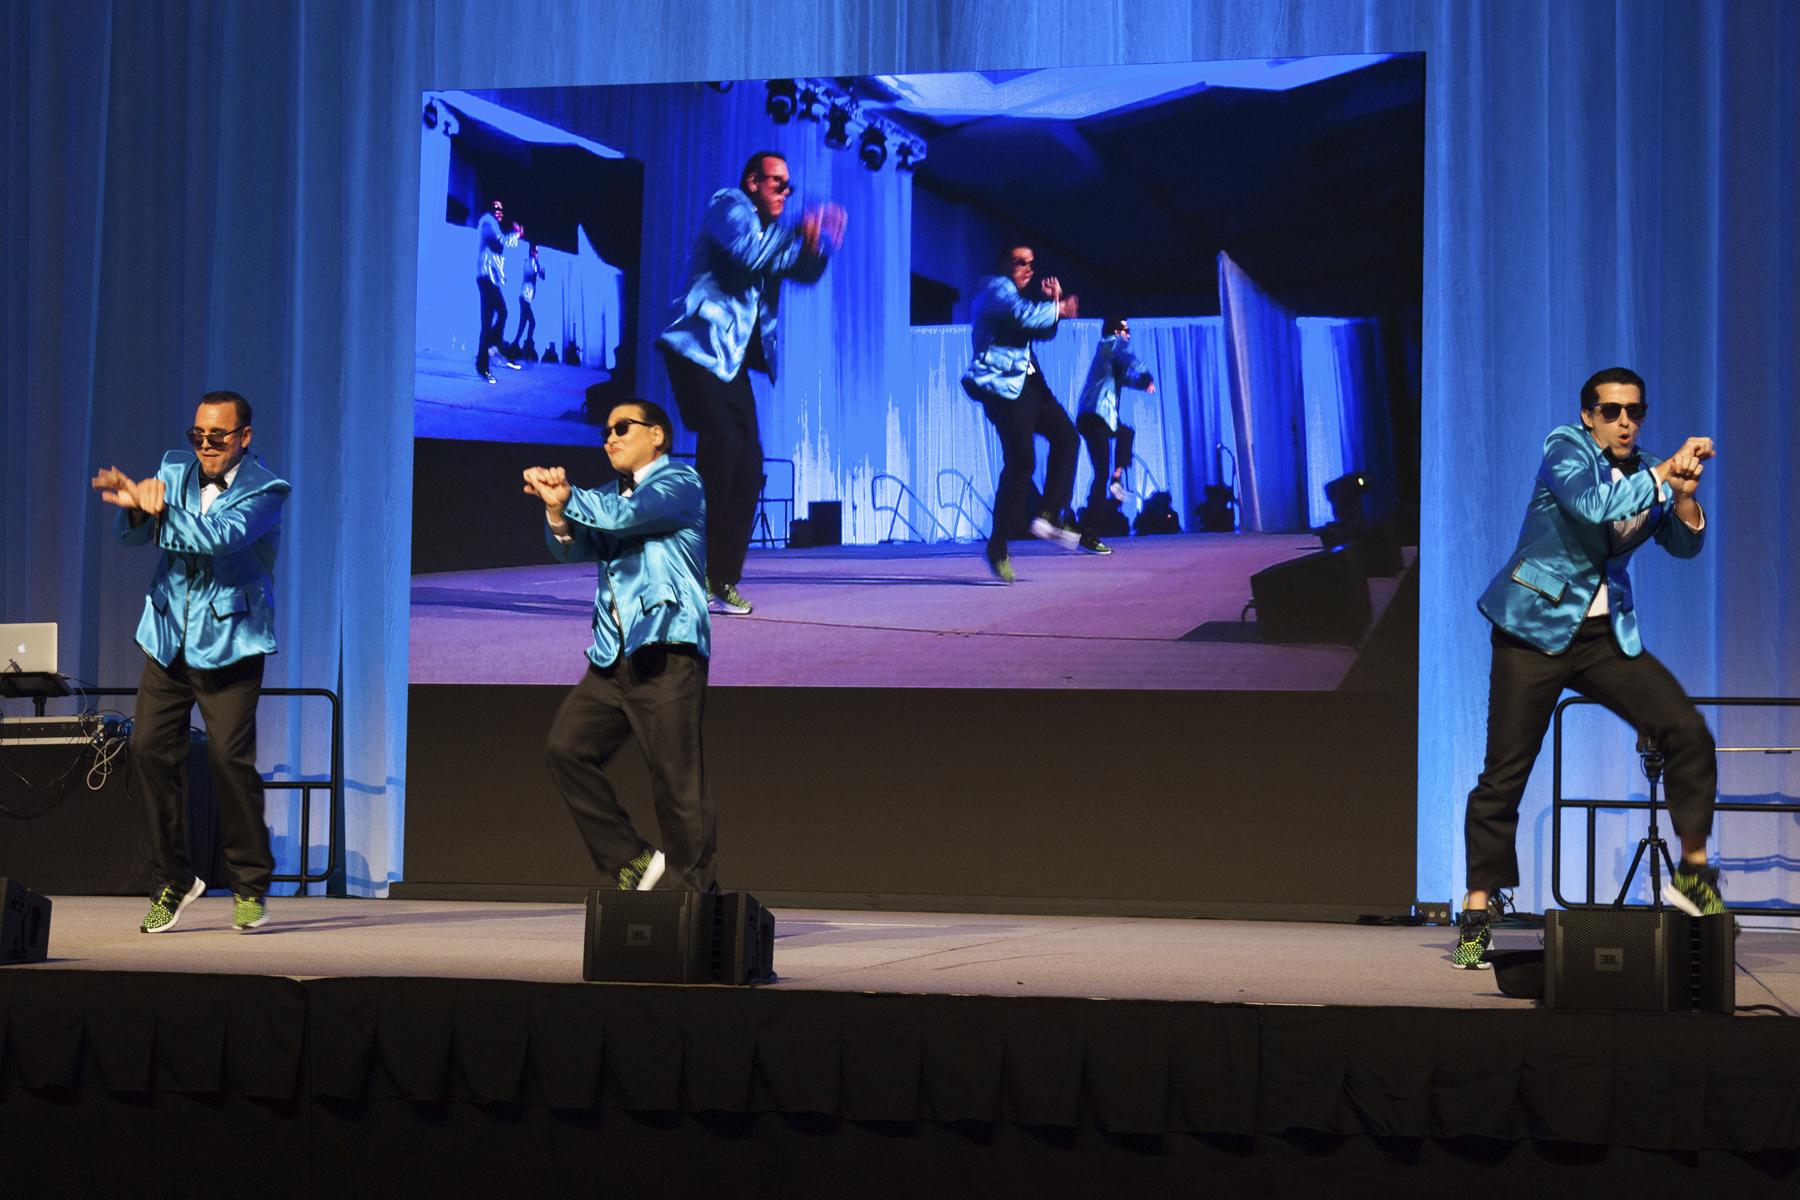 "2016 AN EVENING AROUND THE WORLD: The CFS Gangnam Style Dancers Anton Krucky (Tissue Genesis, Inc.), Mark Yamakawa (Hawaii Dental Service), & Tony Mizuno (Bank of Hawaii) show off their ""PSY"" dance moves!"